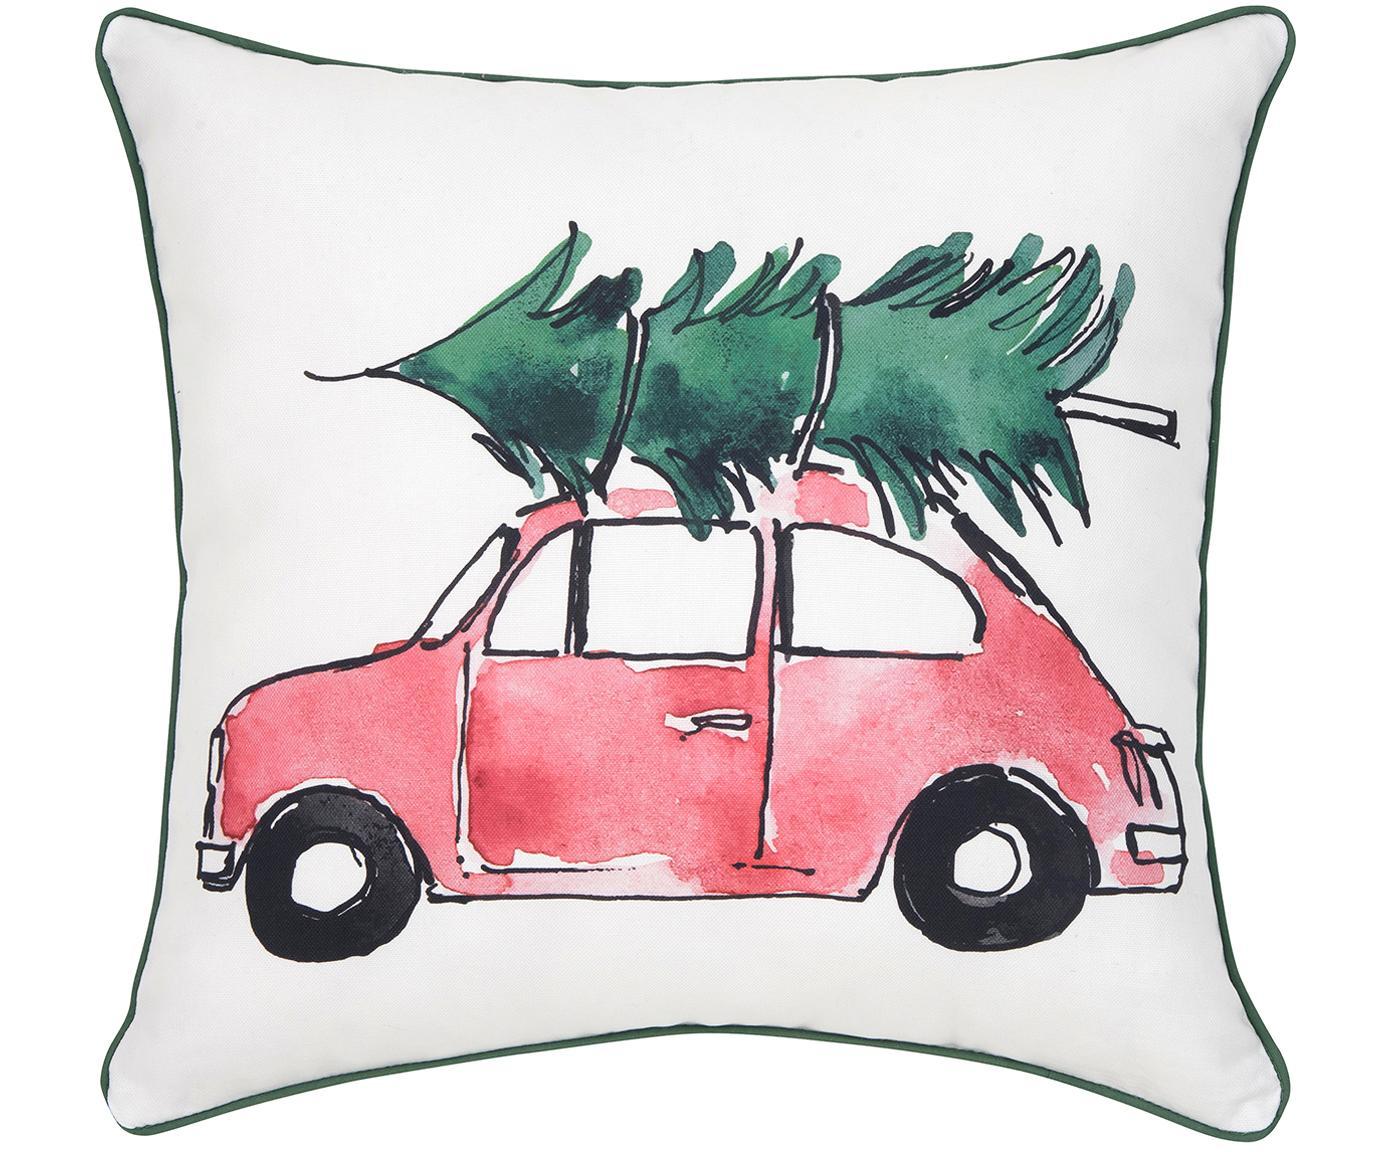 Kissenhülle Xmas Tree, Baumwolle, Kissen: MehrfarbigKederumrandung: Grün, 40 x 40 cm